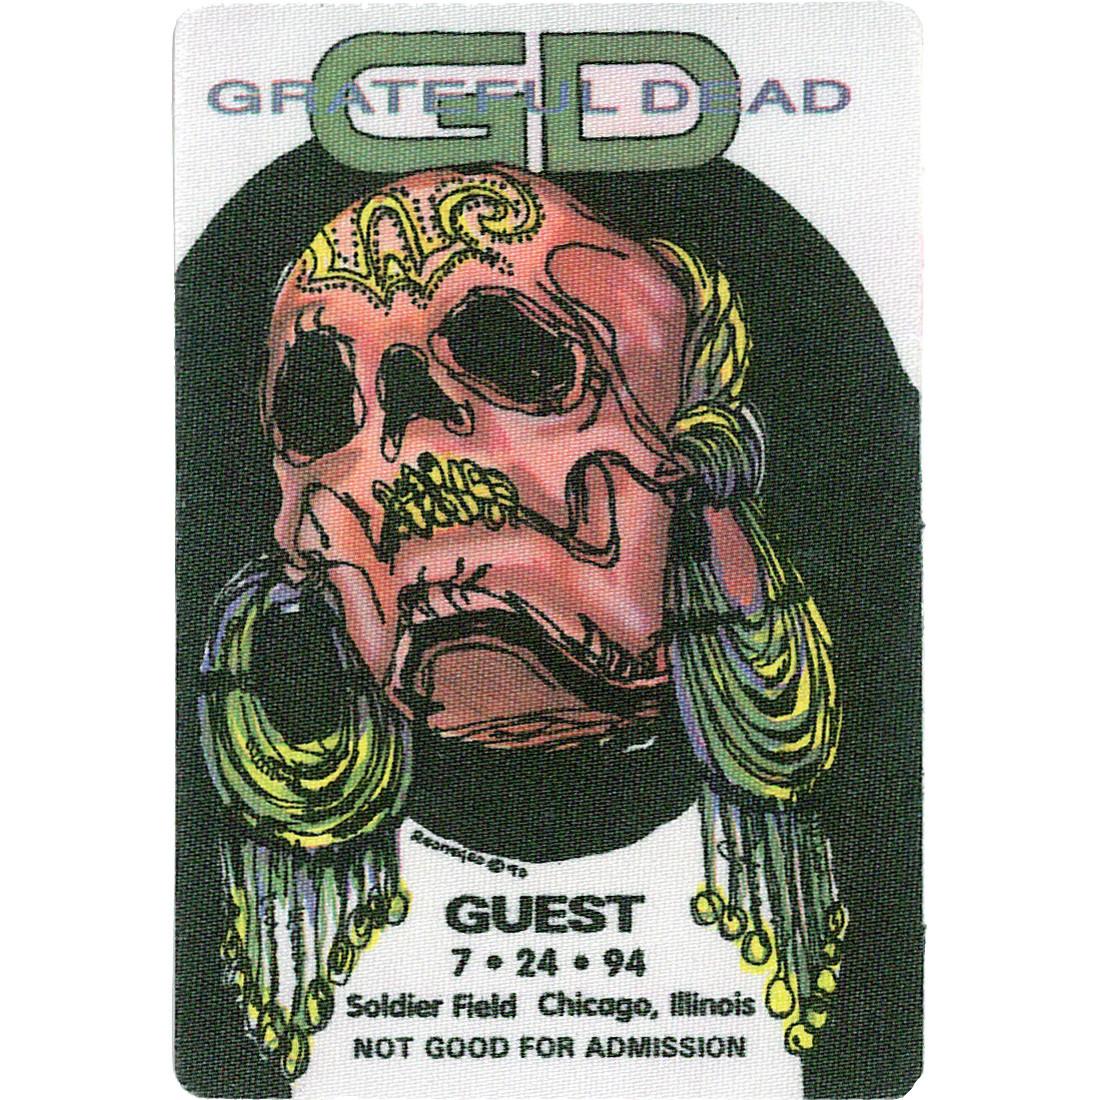 Grateful Dead 1994 07-24 Backstage Pass